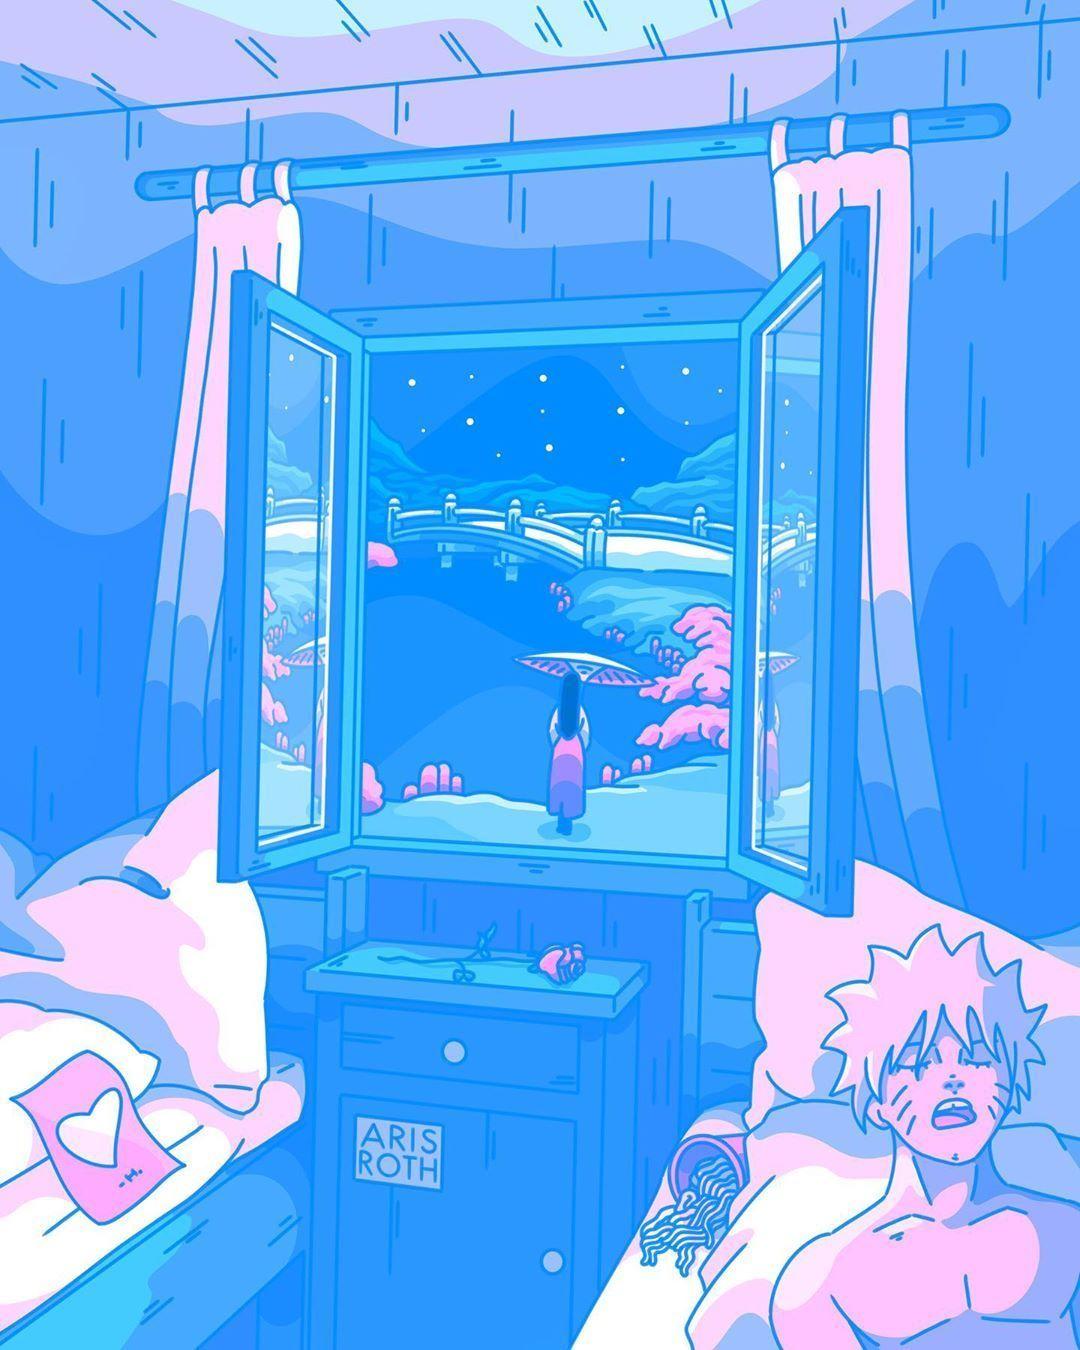 Digital Artist Aris Roth Digital Art Artwoonz In 2020 Blue Anime Blue Aesthetic Pastel Anime Wall Art